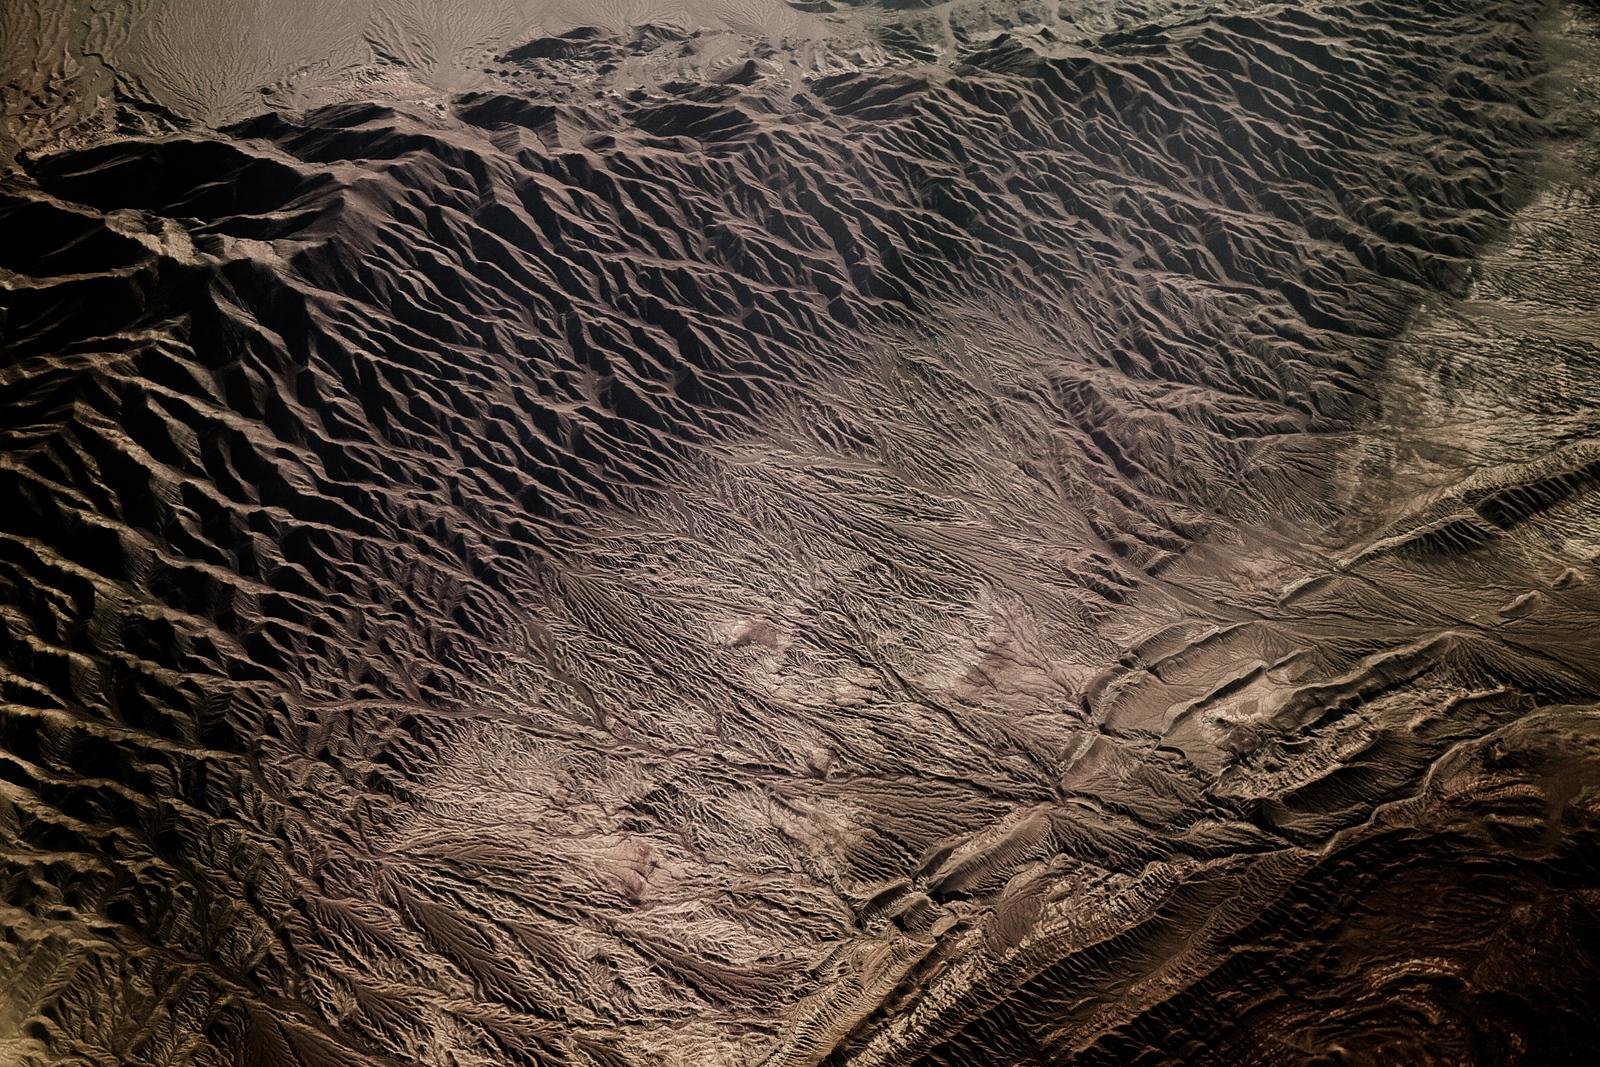 Kavir Desert, Iran. Semnan 35.472660, 53.900007